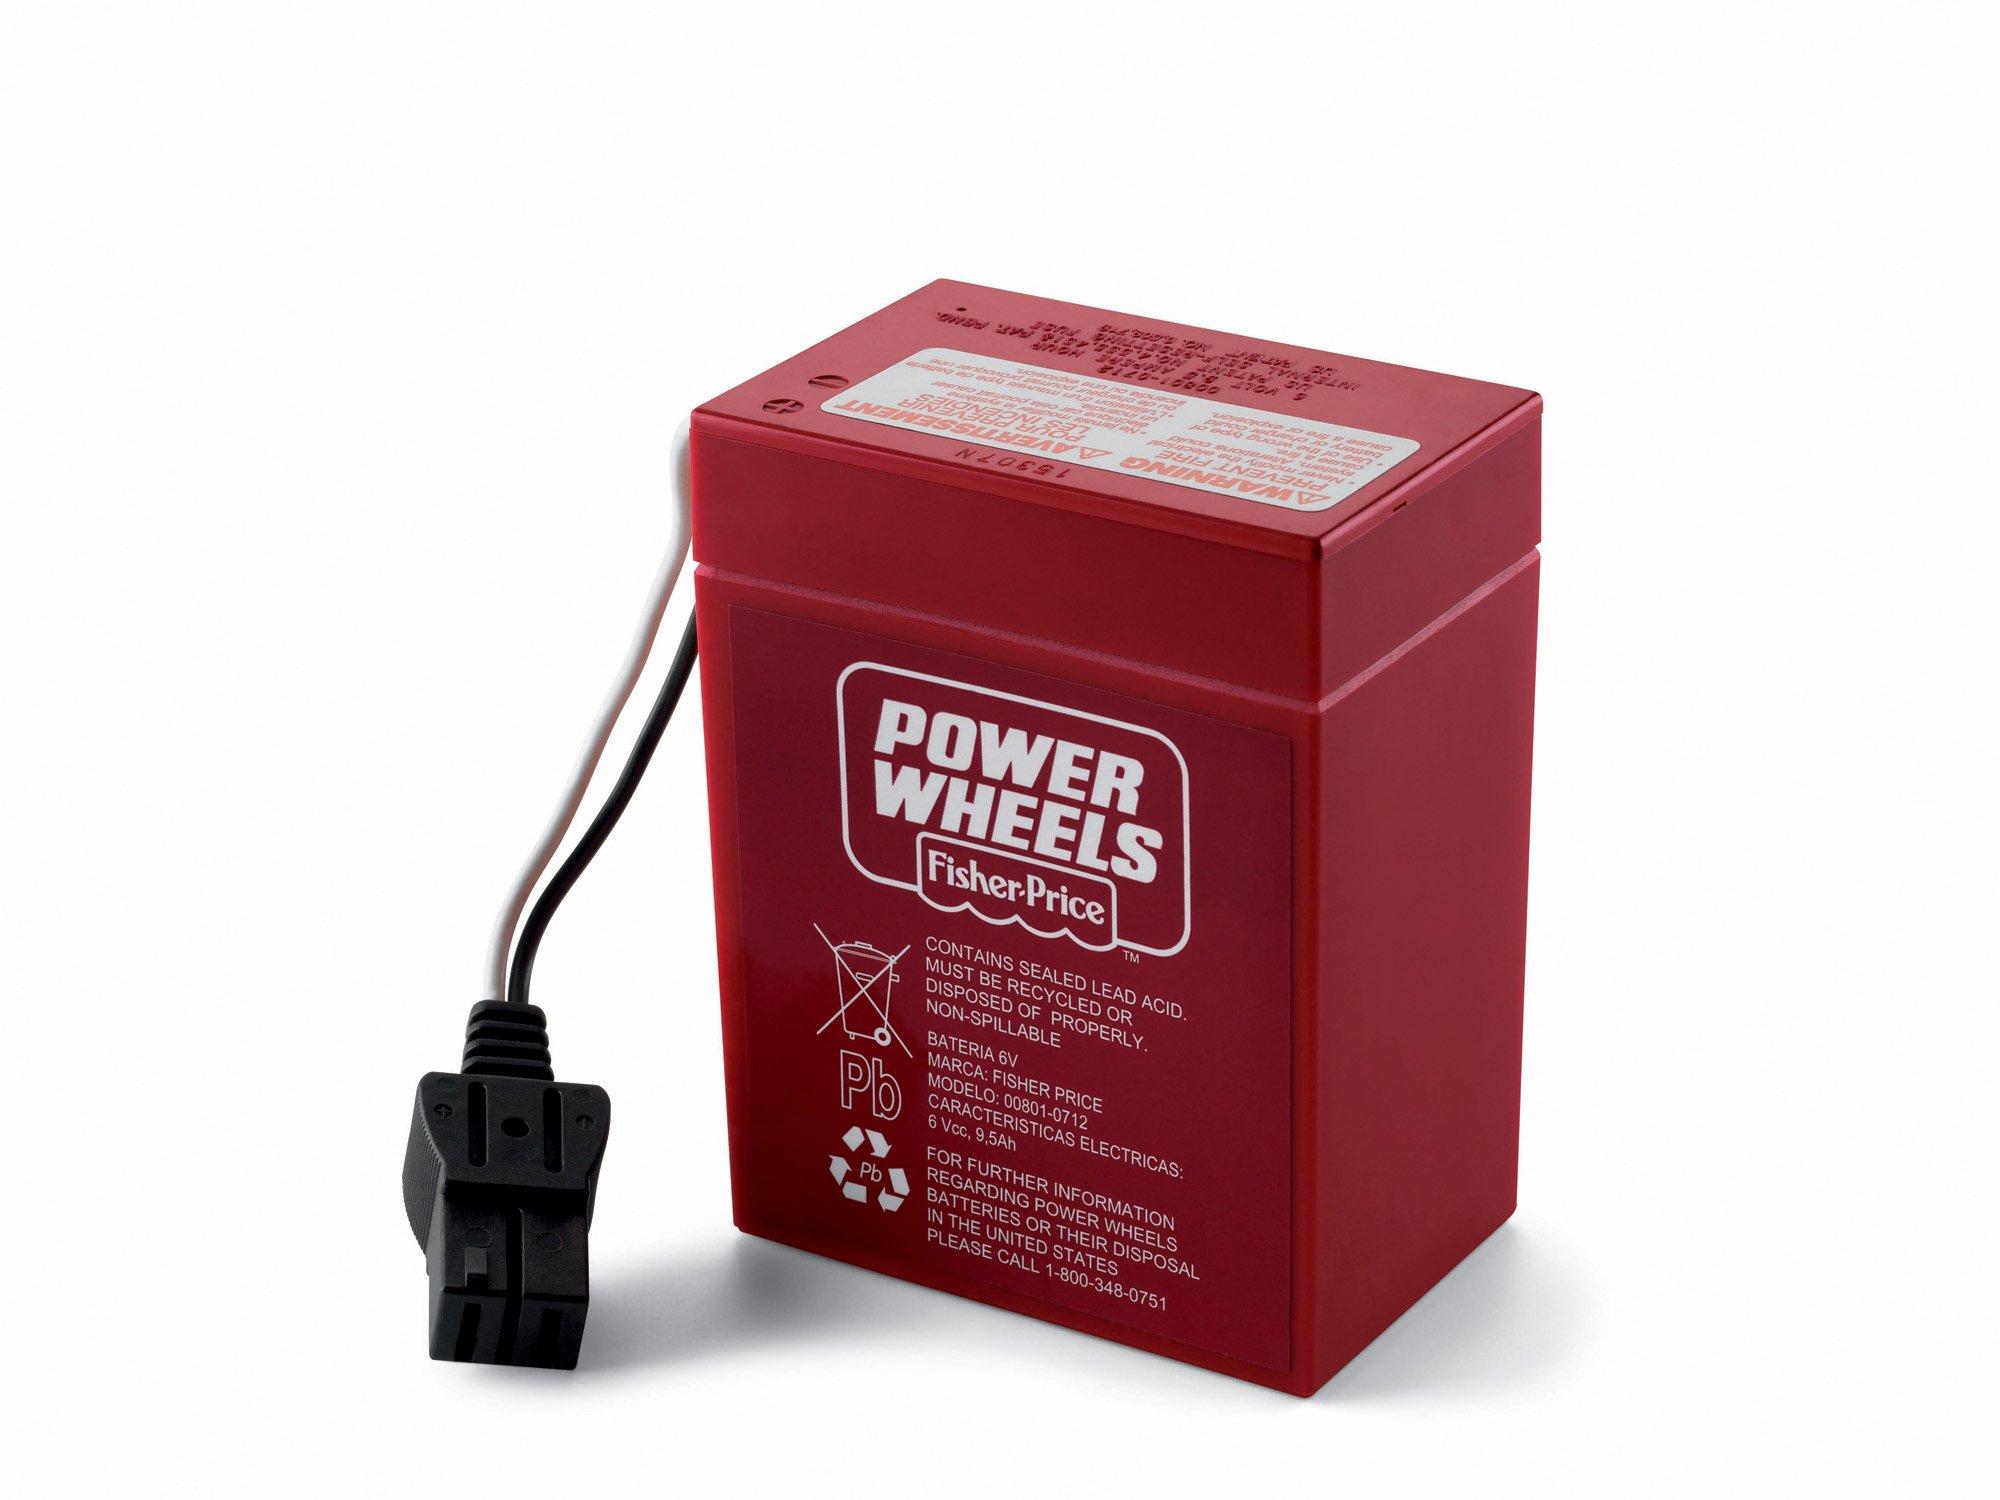 Power Wheels Jeep Wrangler Wiring Wiring Diagrams Lose